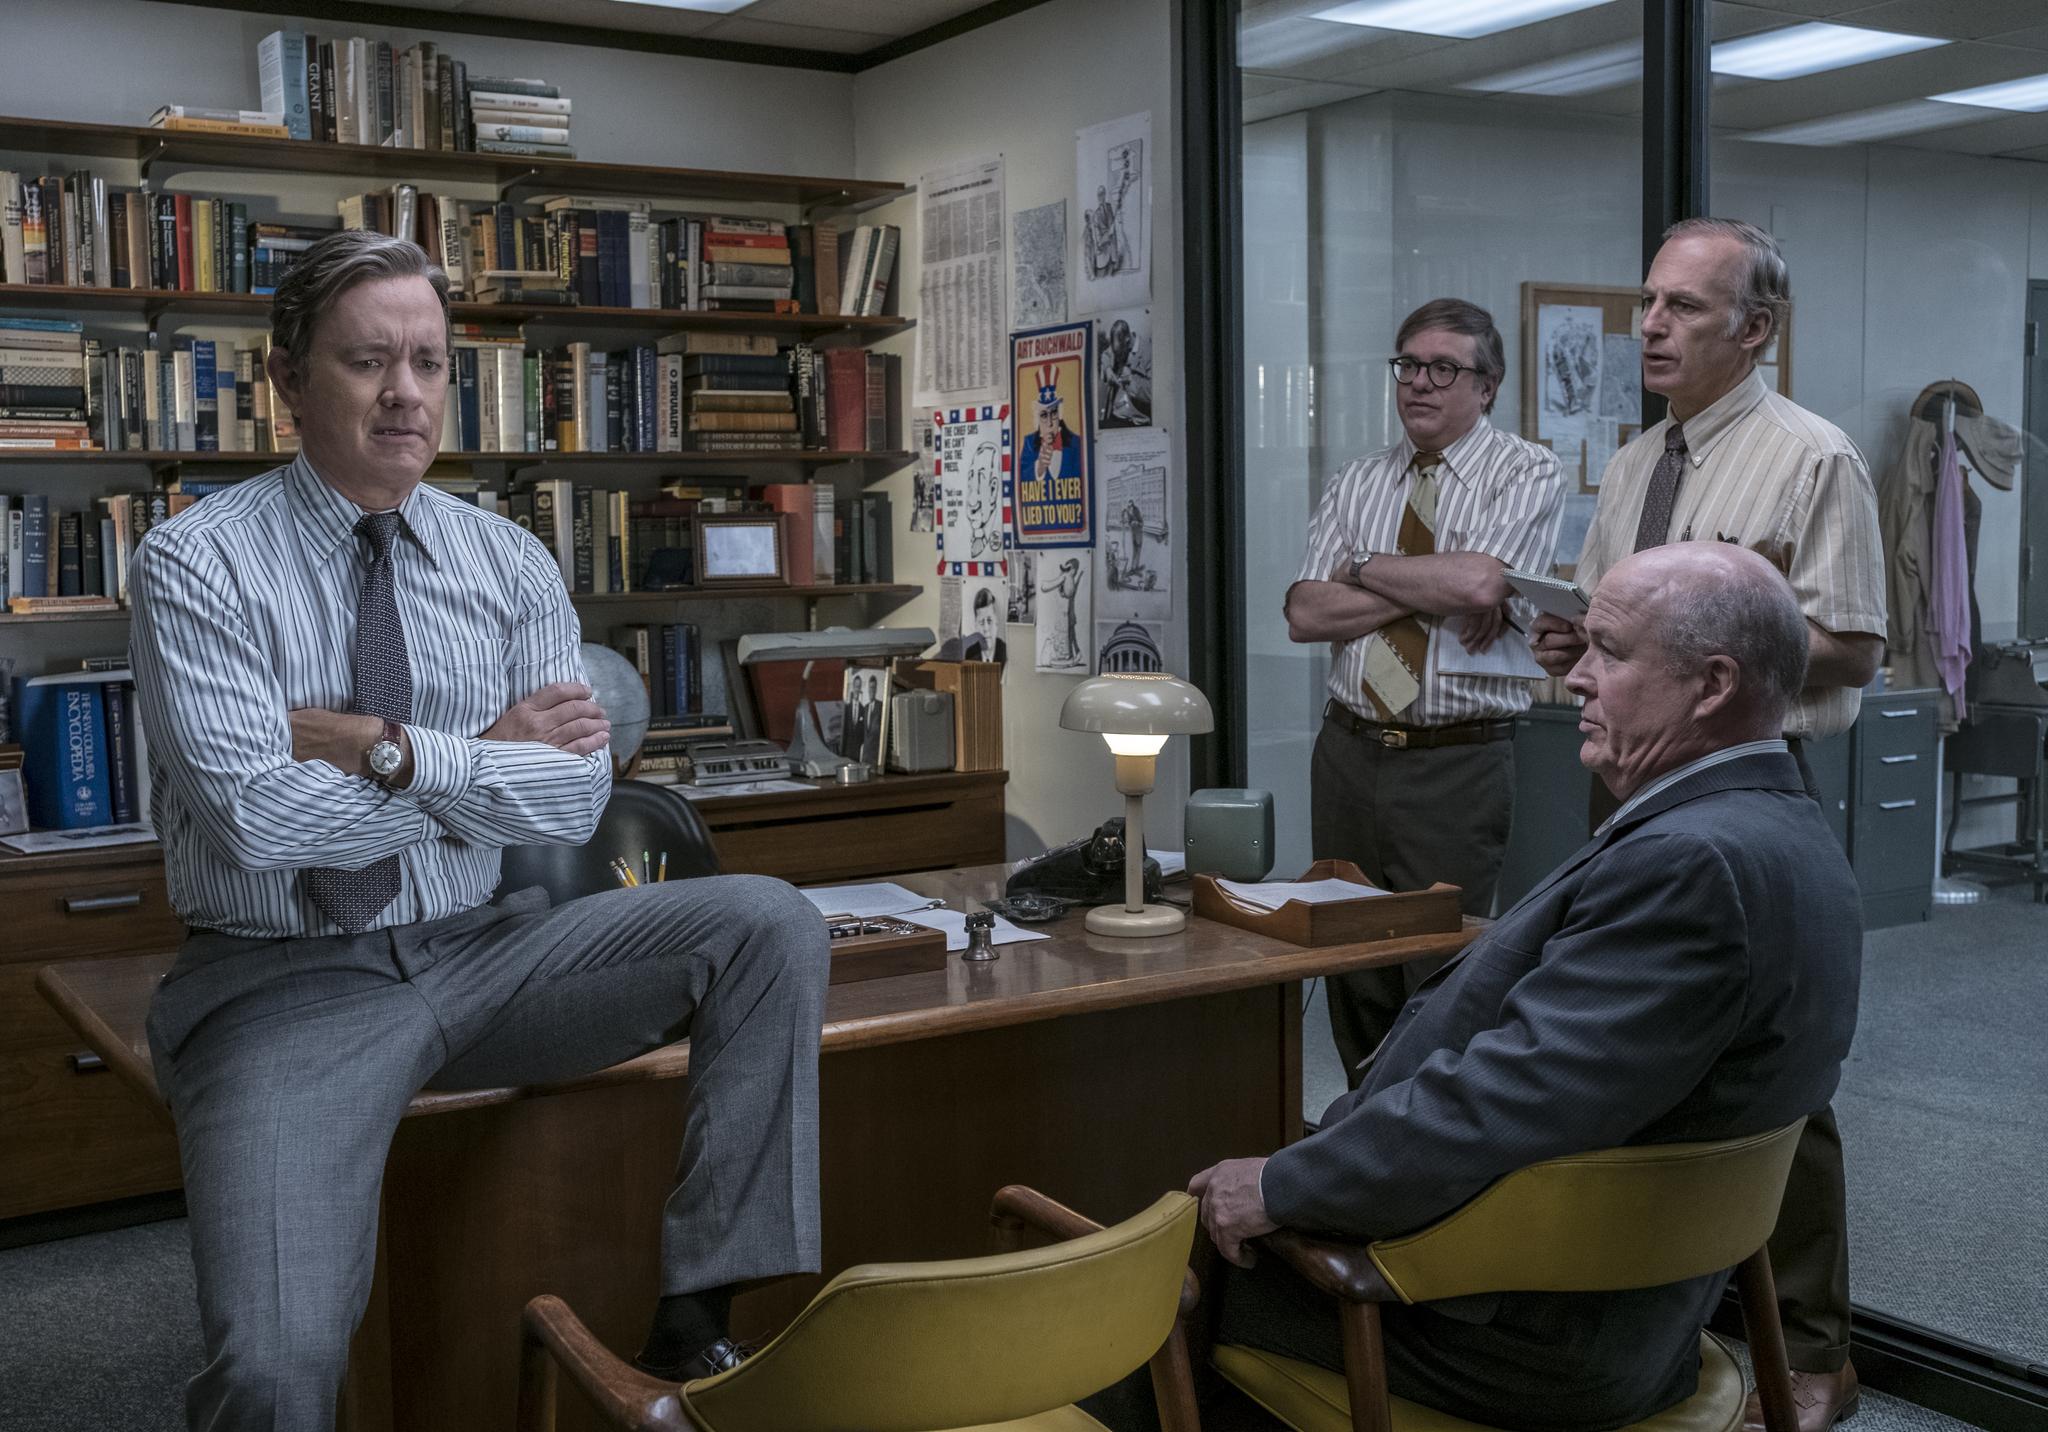 Tom Hanks, David Cross, Bob Odenkirk, and John Rue in The Post (2017)